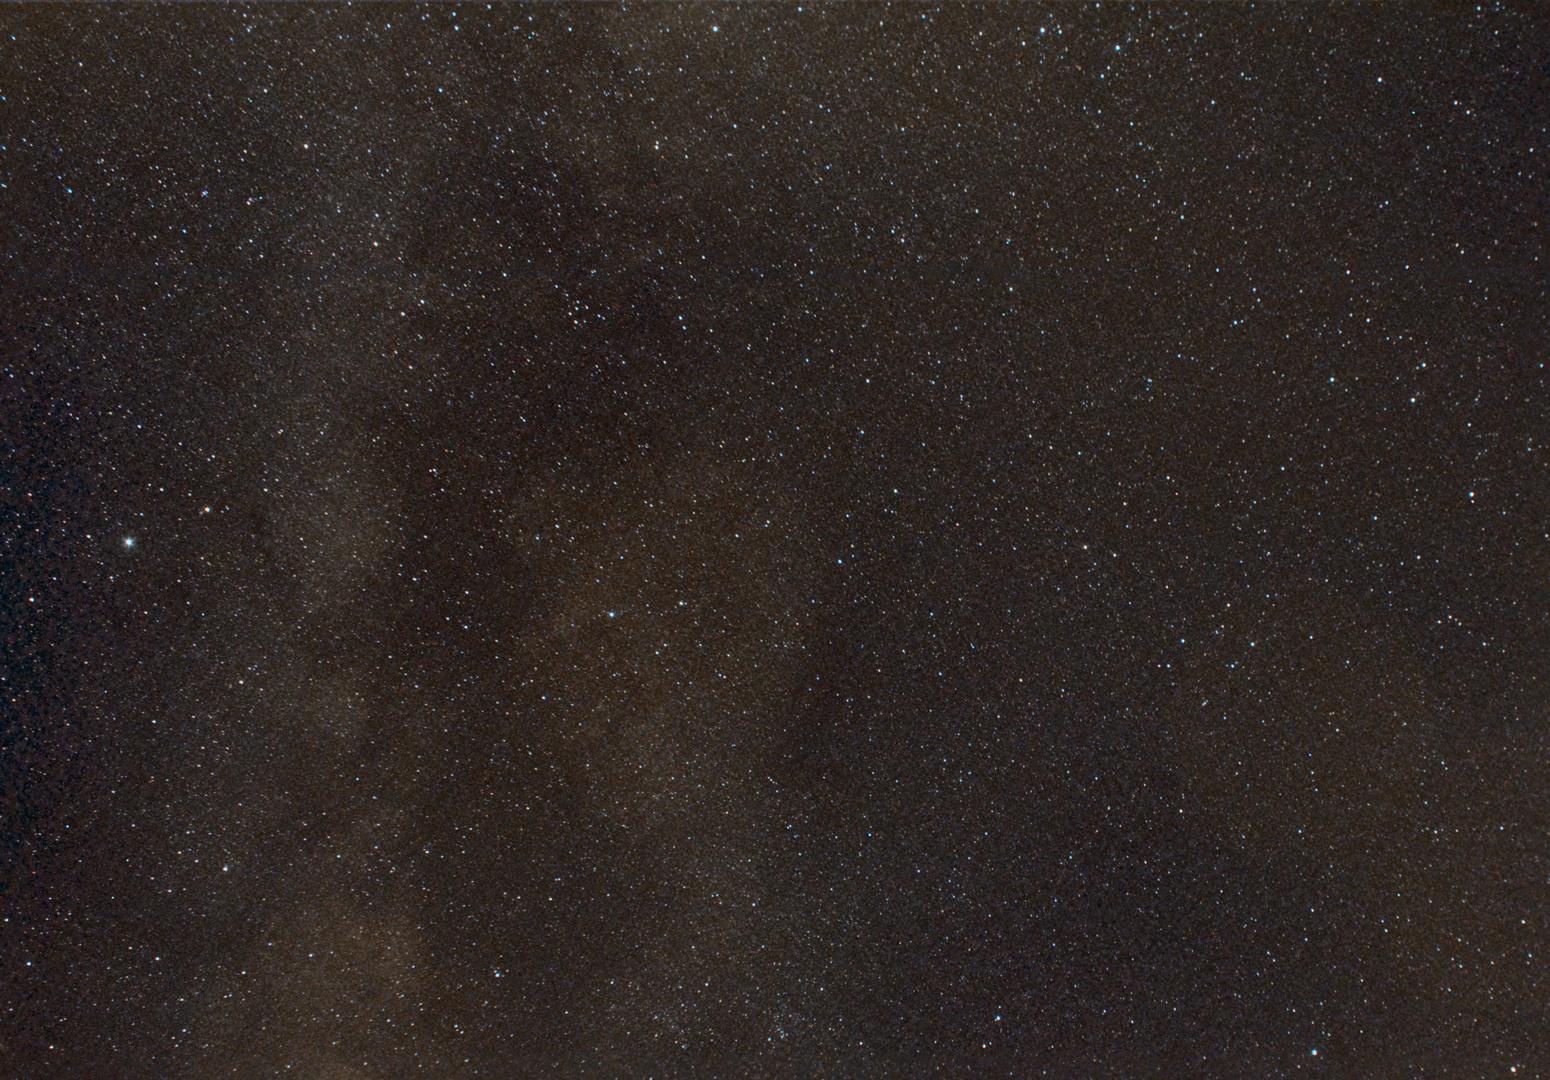 Stars11.jpg.0f218df25a0e9a94ae34a9c30ebc3ac8.jpg